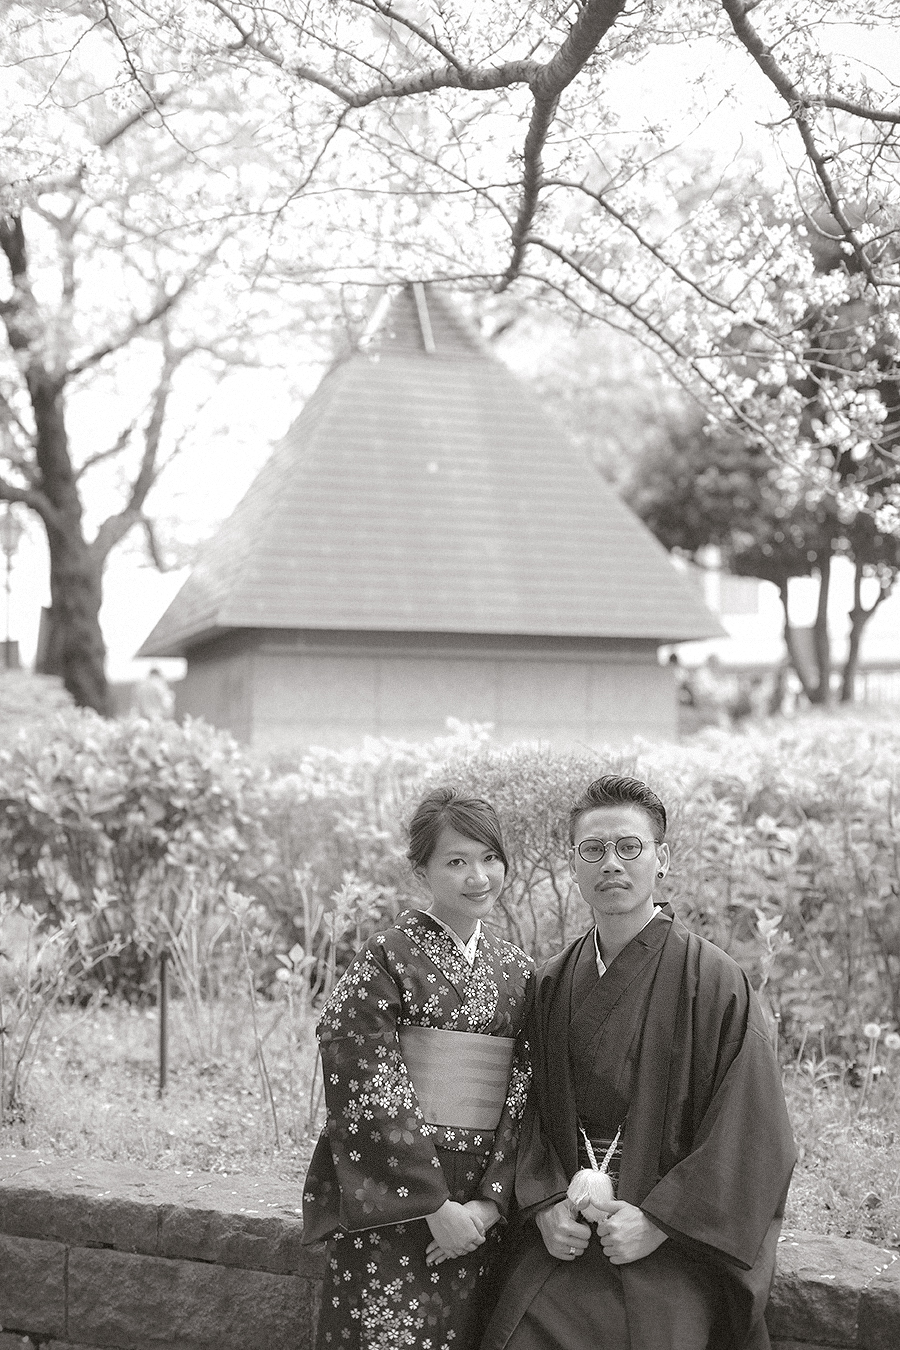 tokyo hakone japan spring sakura . engagement wedding photography by kurt ahs . ns + eu . 0416.jpg